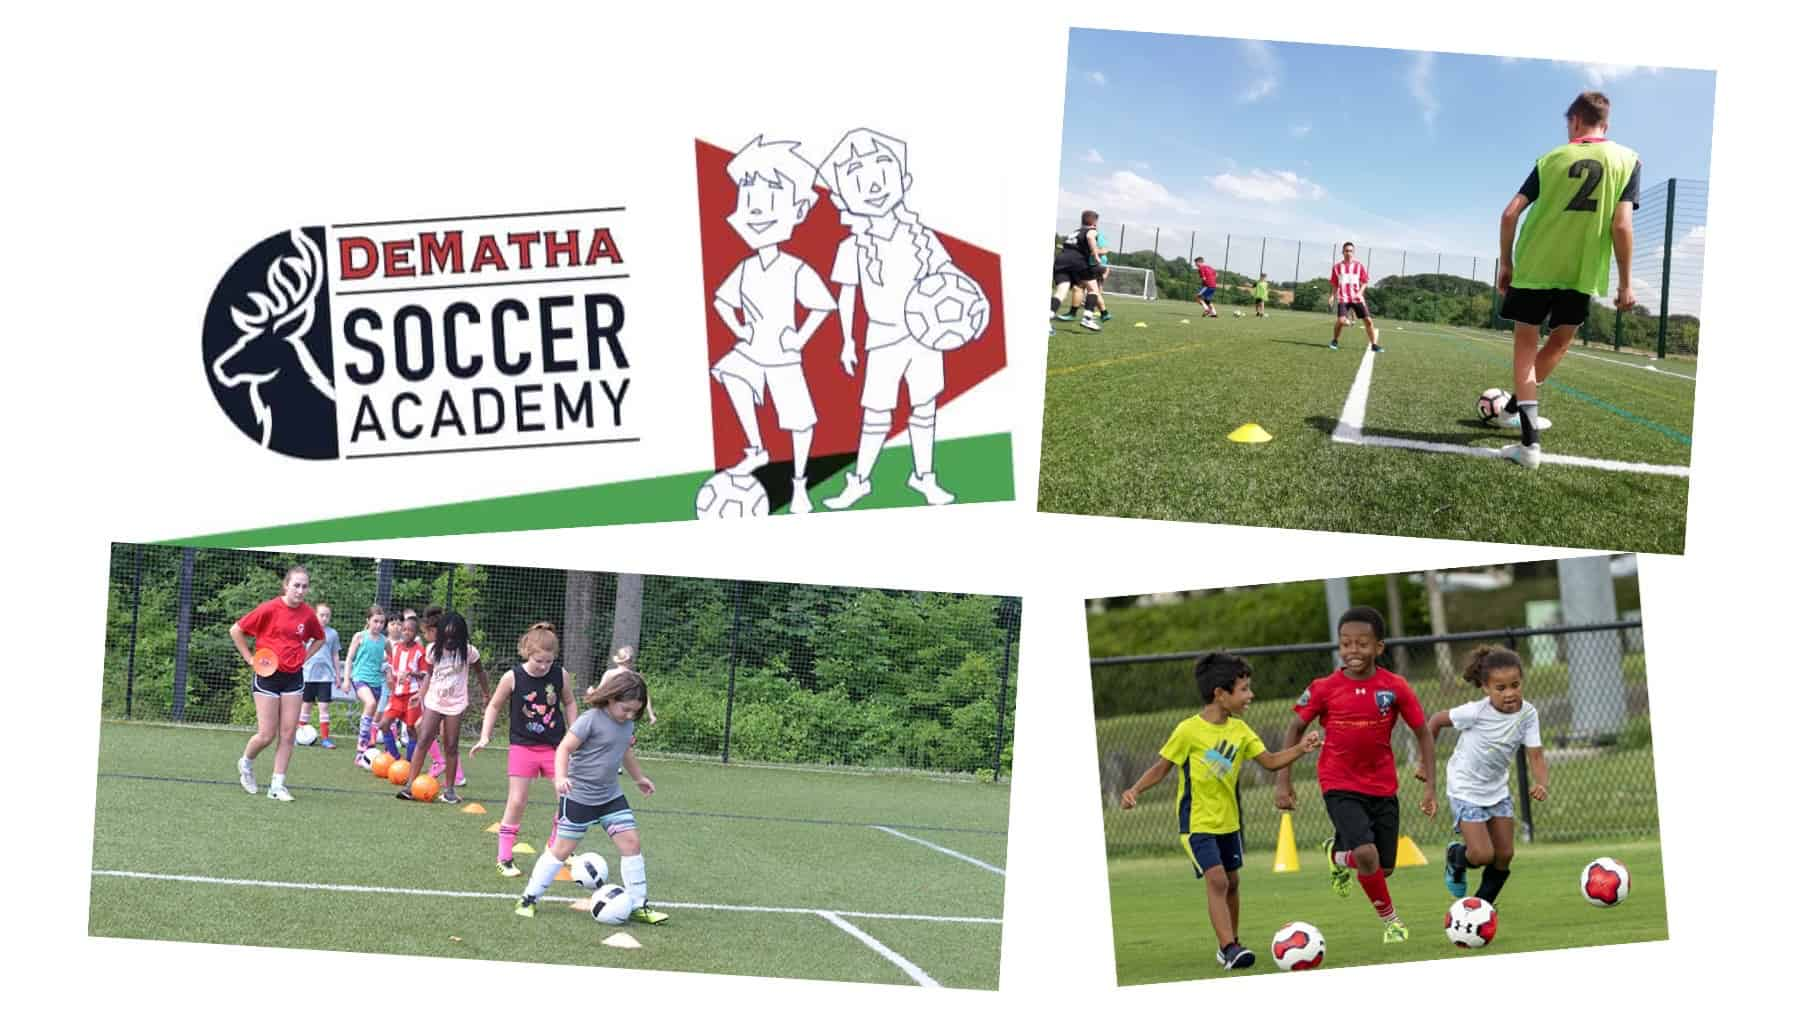 DeMatha Soccer Academy Summer Camp